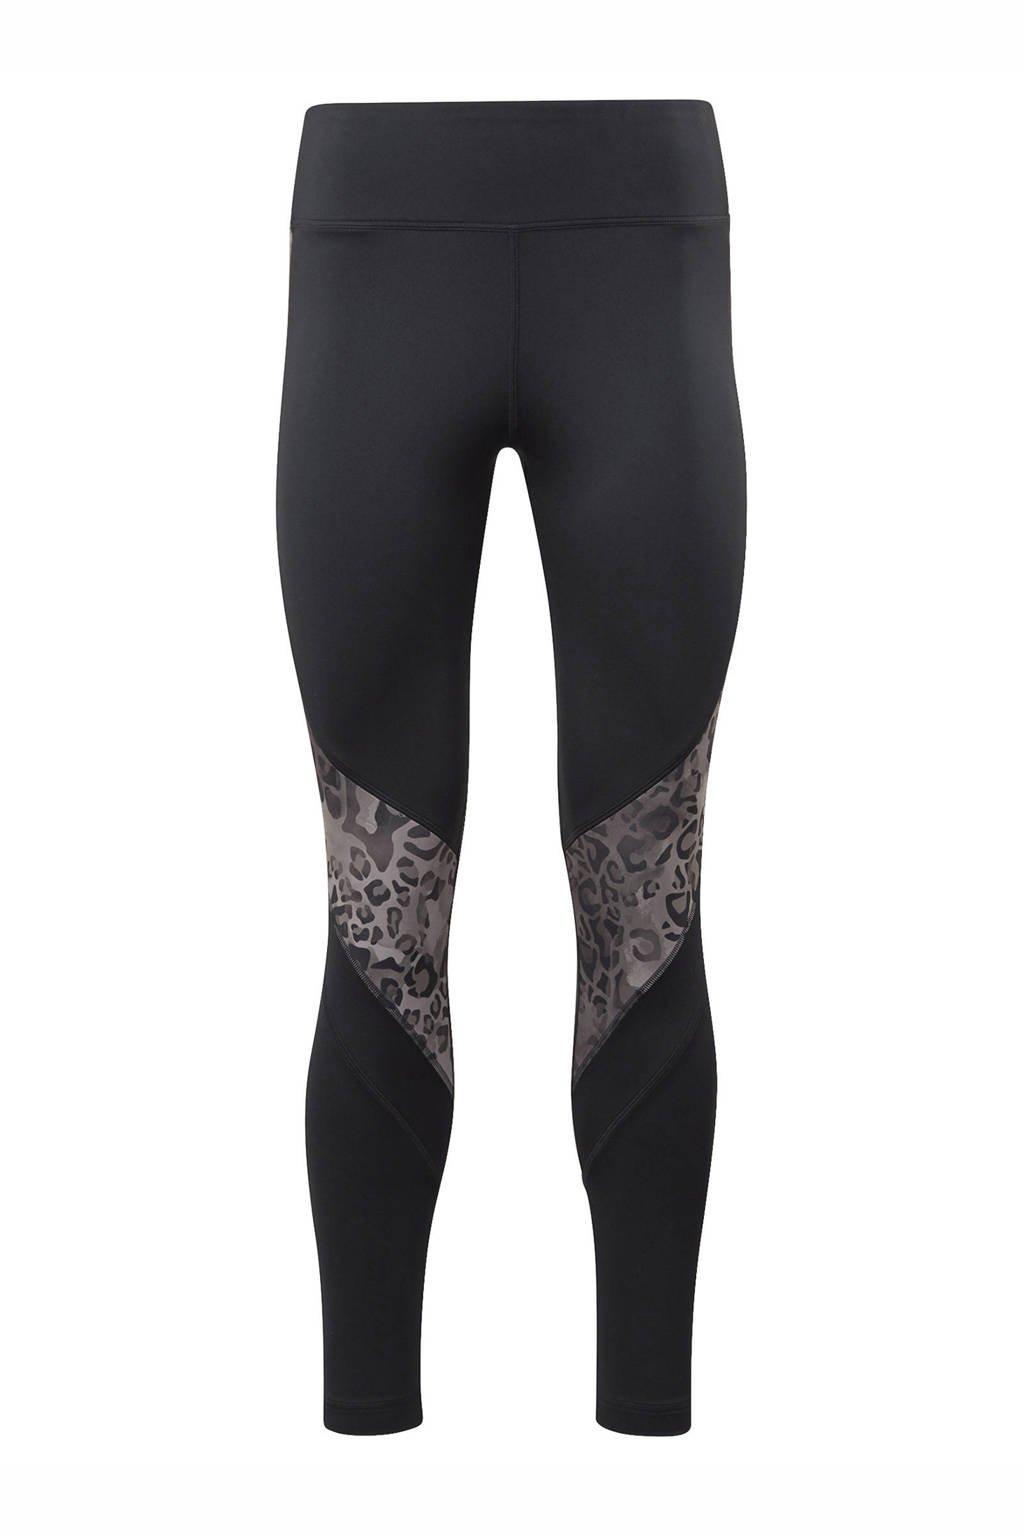 Reebok Training sportbroek zwart/zand, Zwart/zand